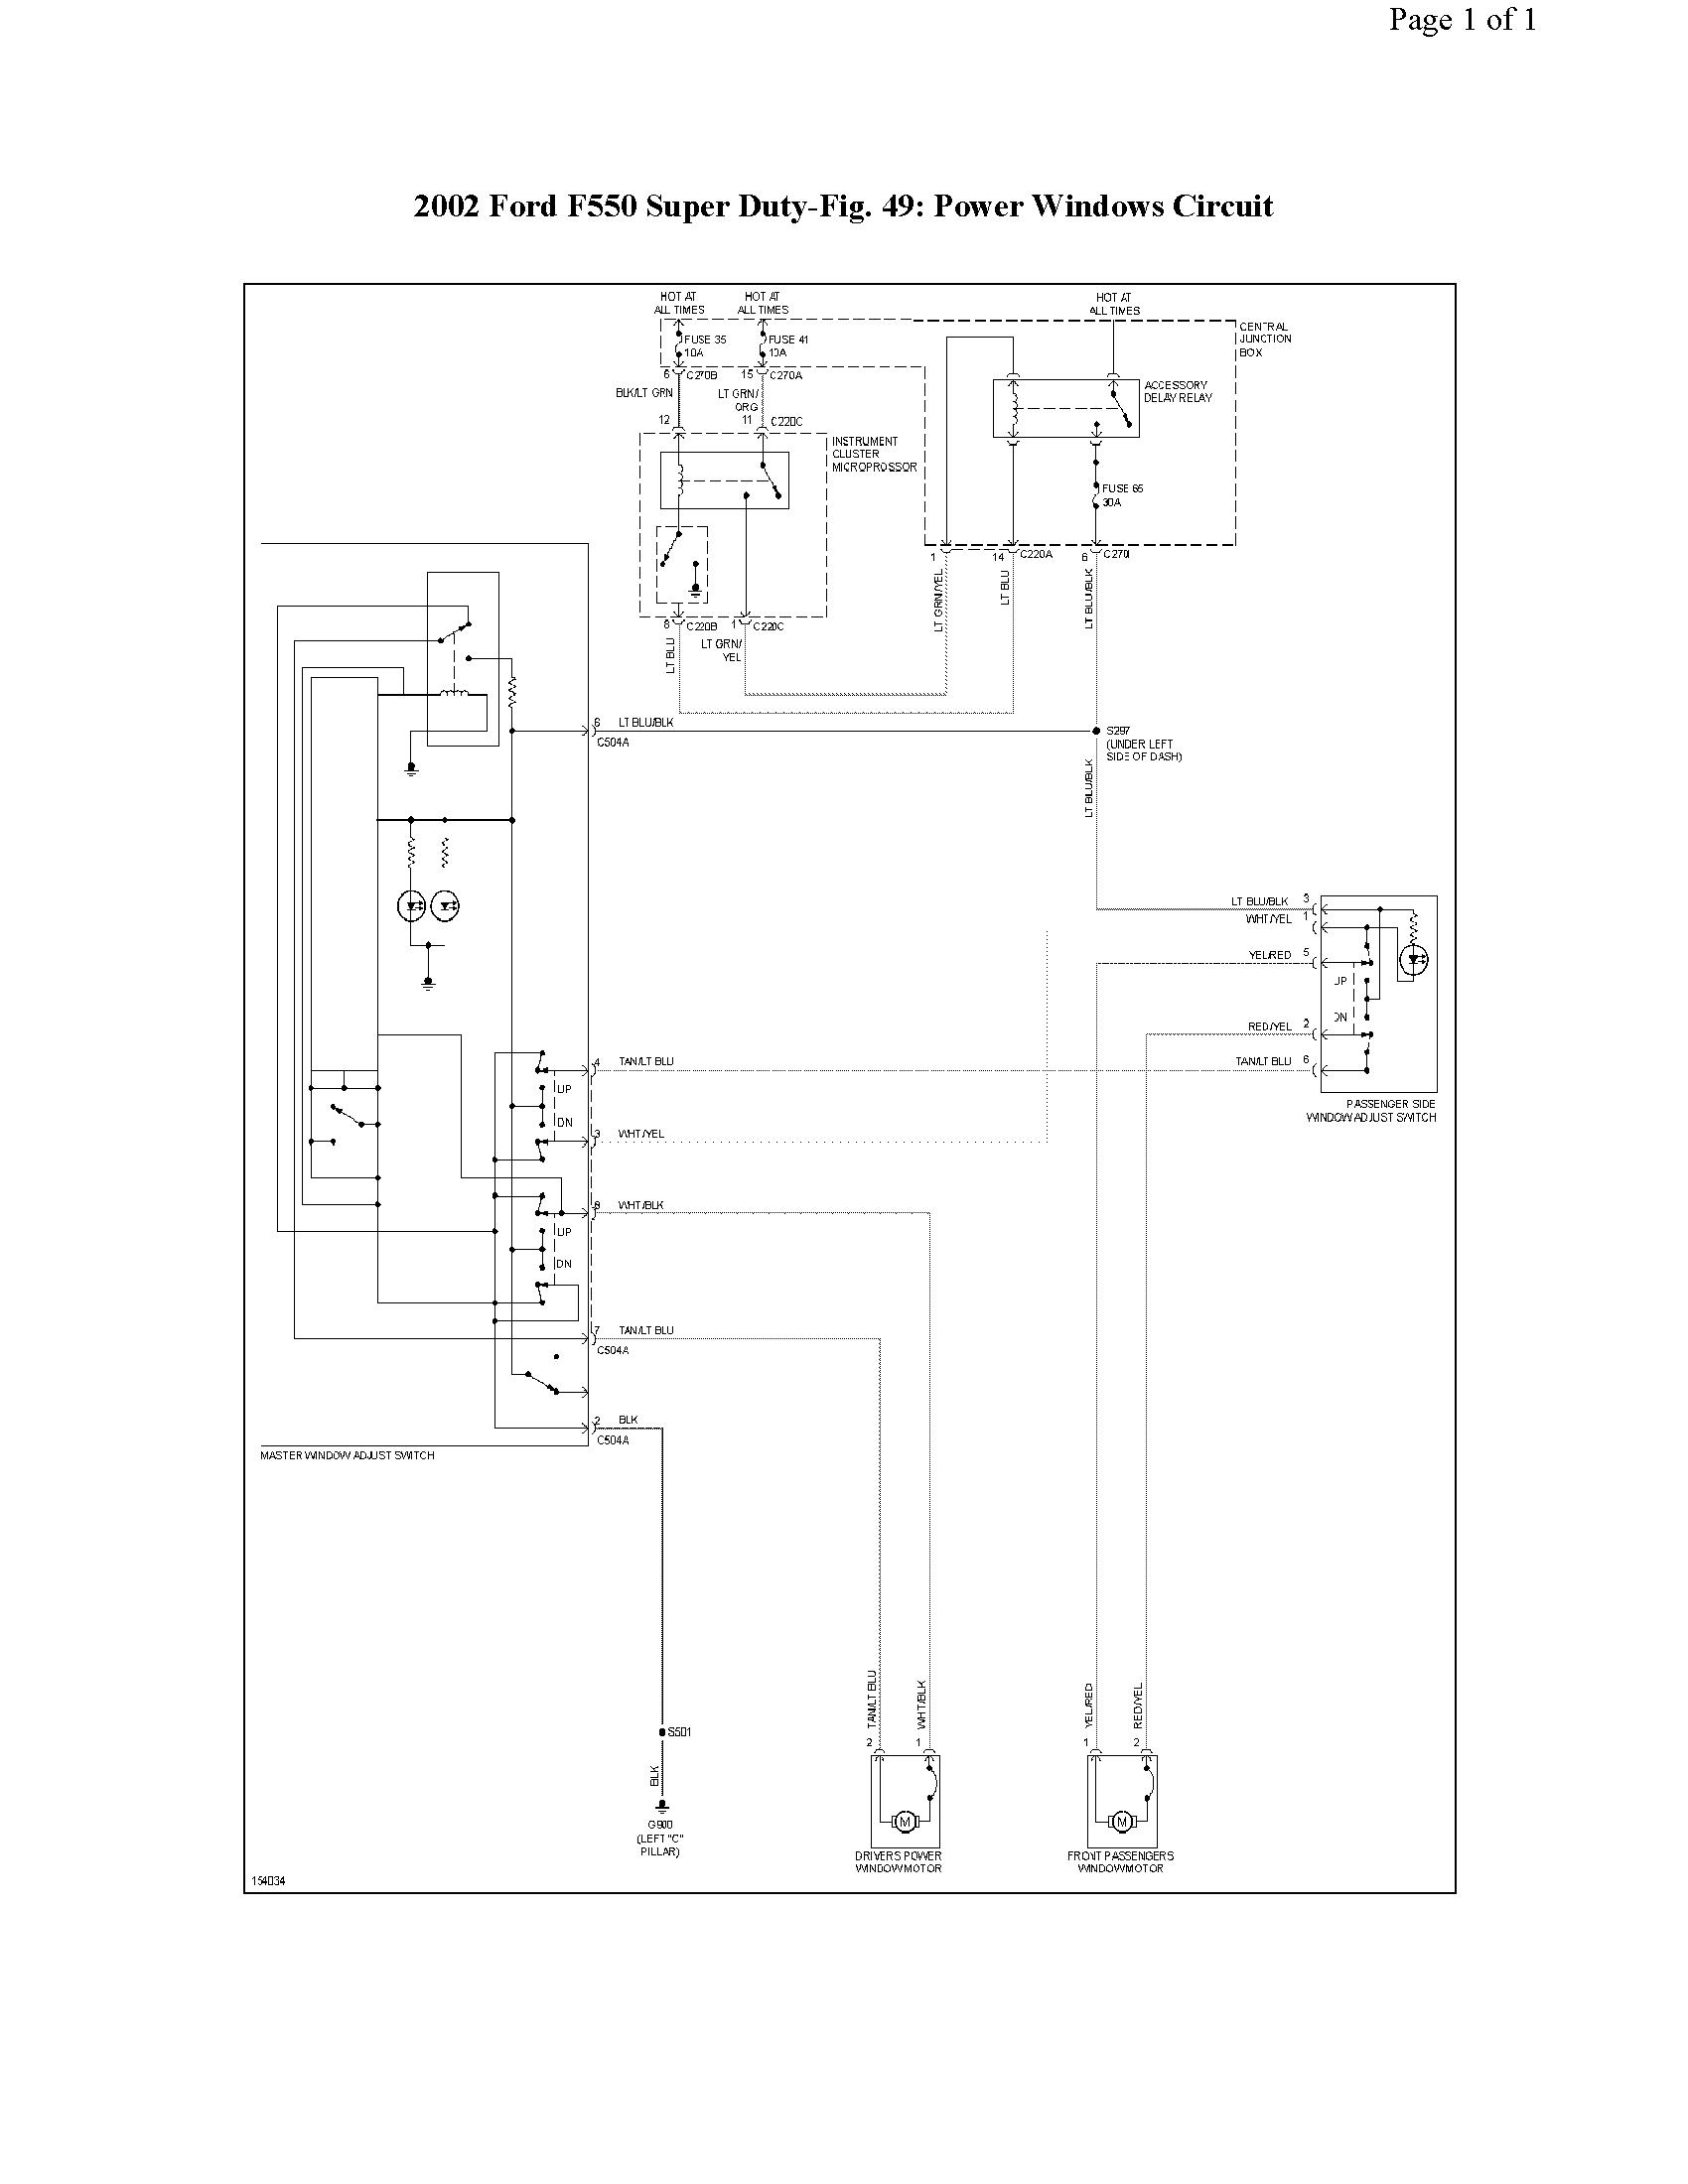 i am working on a 02 f550 super duty 7 3l 4wd fuse 44 kept